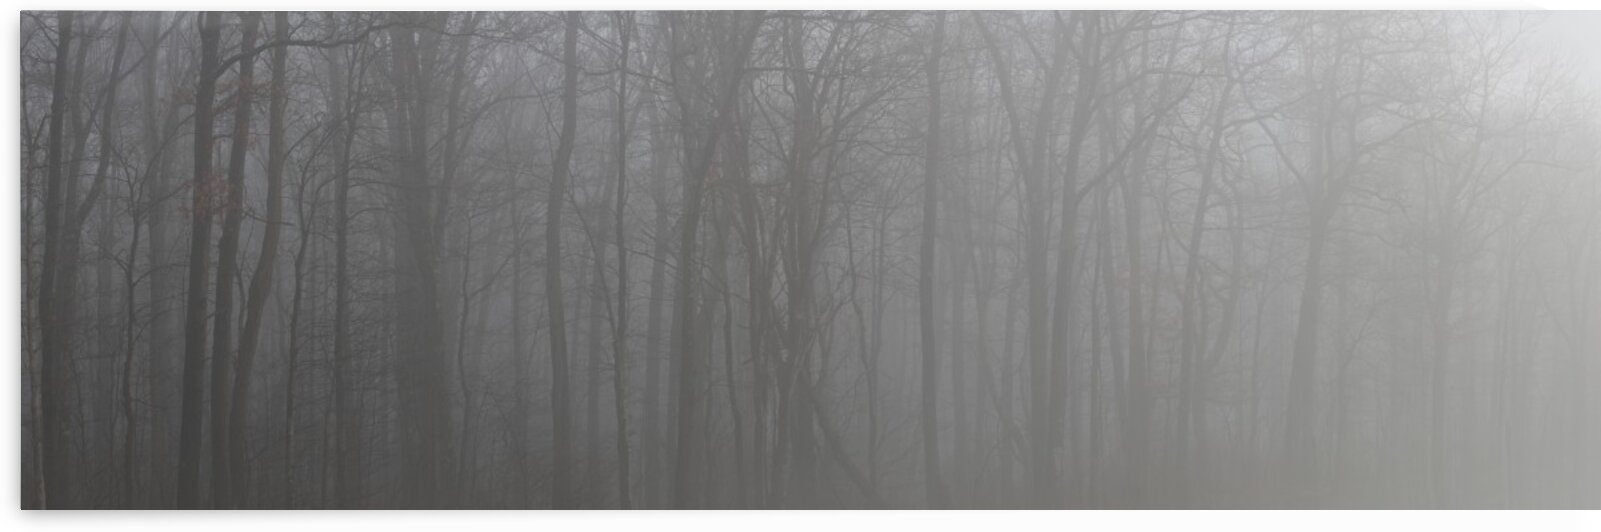 Treeline apmi 1546 by Artistic Photography